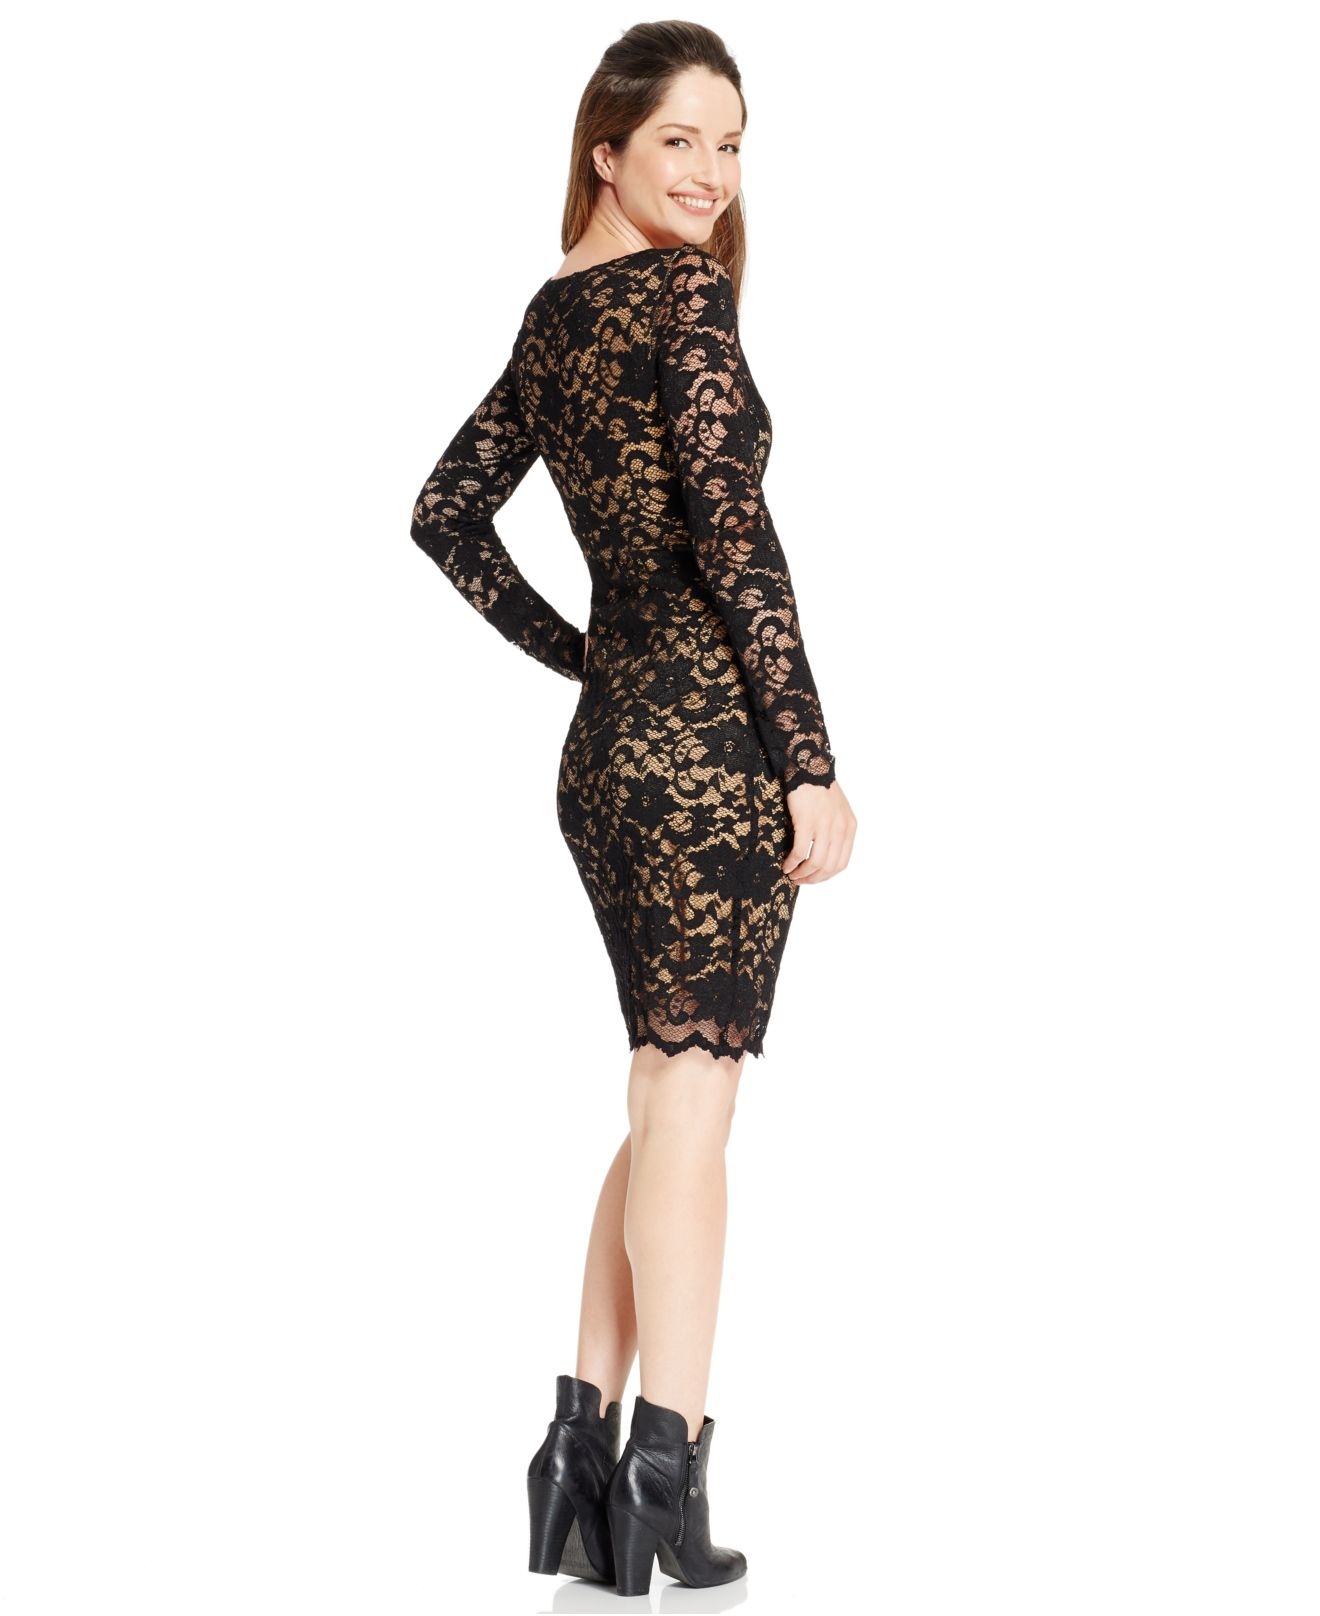 74f94ff2b23b1 Lyst - Karen Kane V-neck Lace Dress in Black